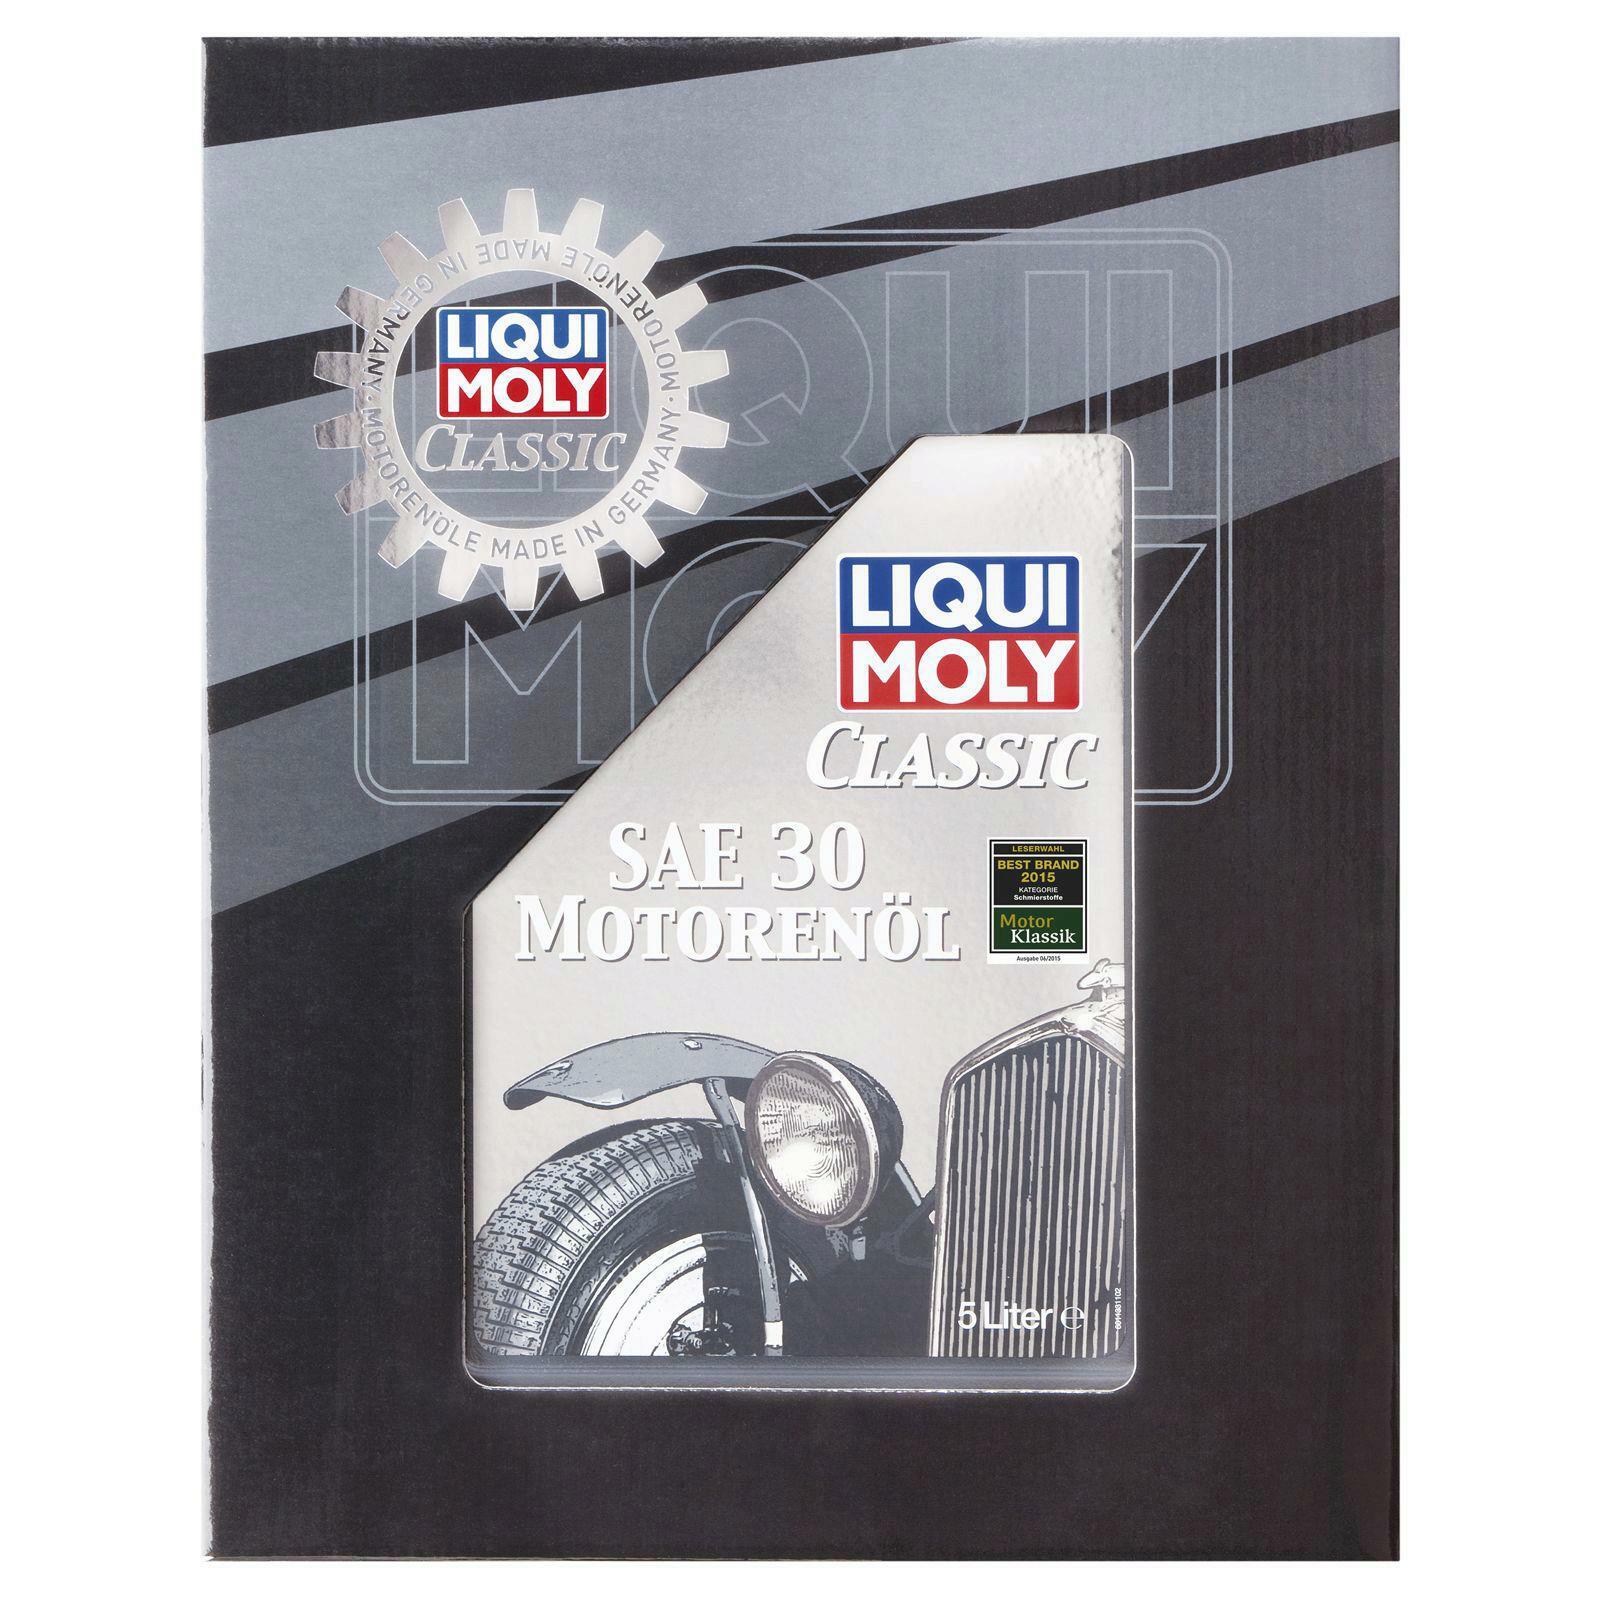 liqui moly classic motoren l sae 30 5l 1133 lott autoteile. Black Bedroom Furniture Sets. Home Design Ideas